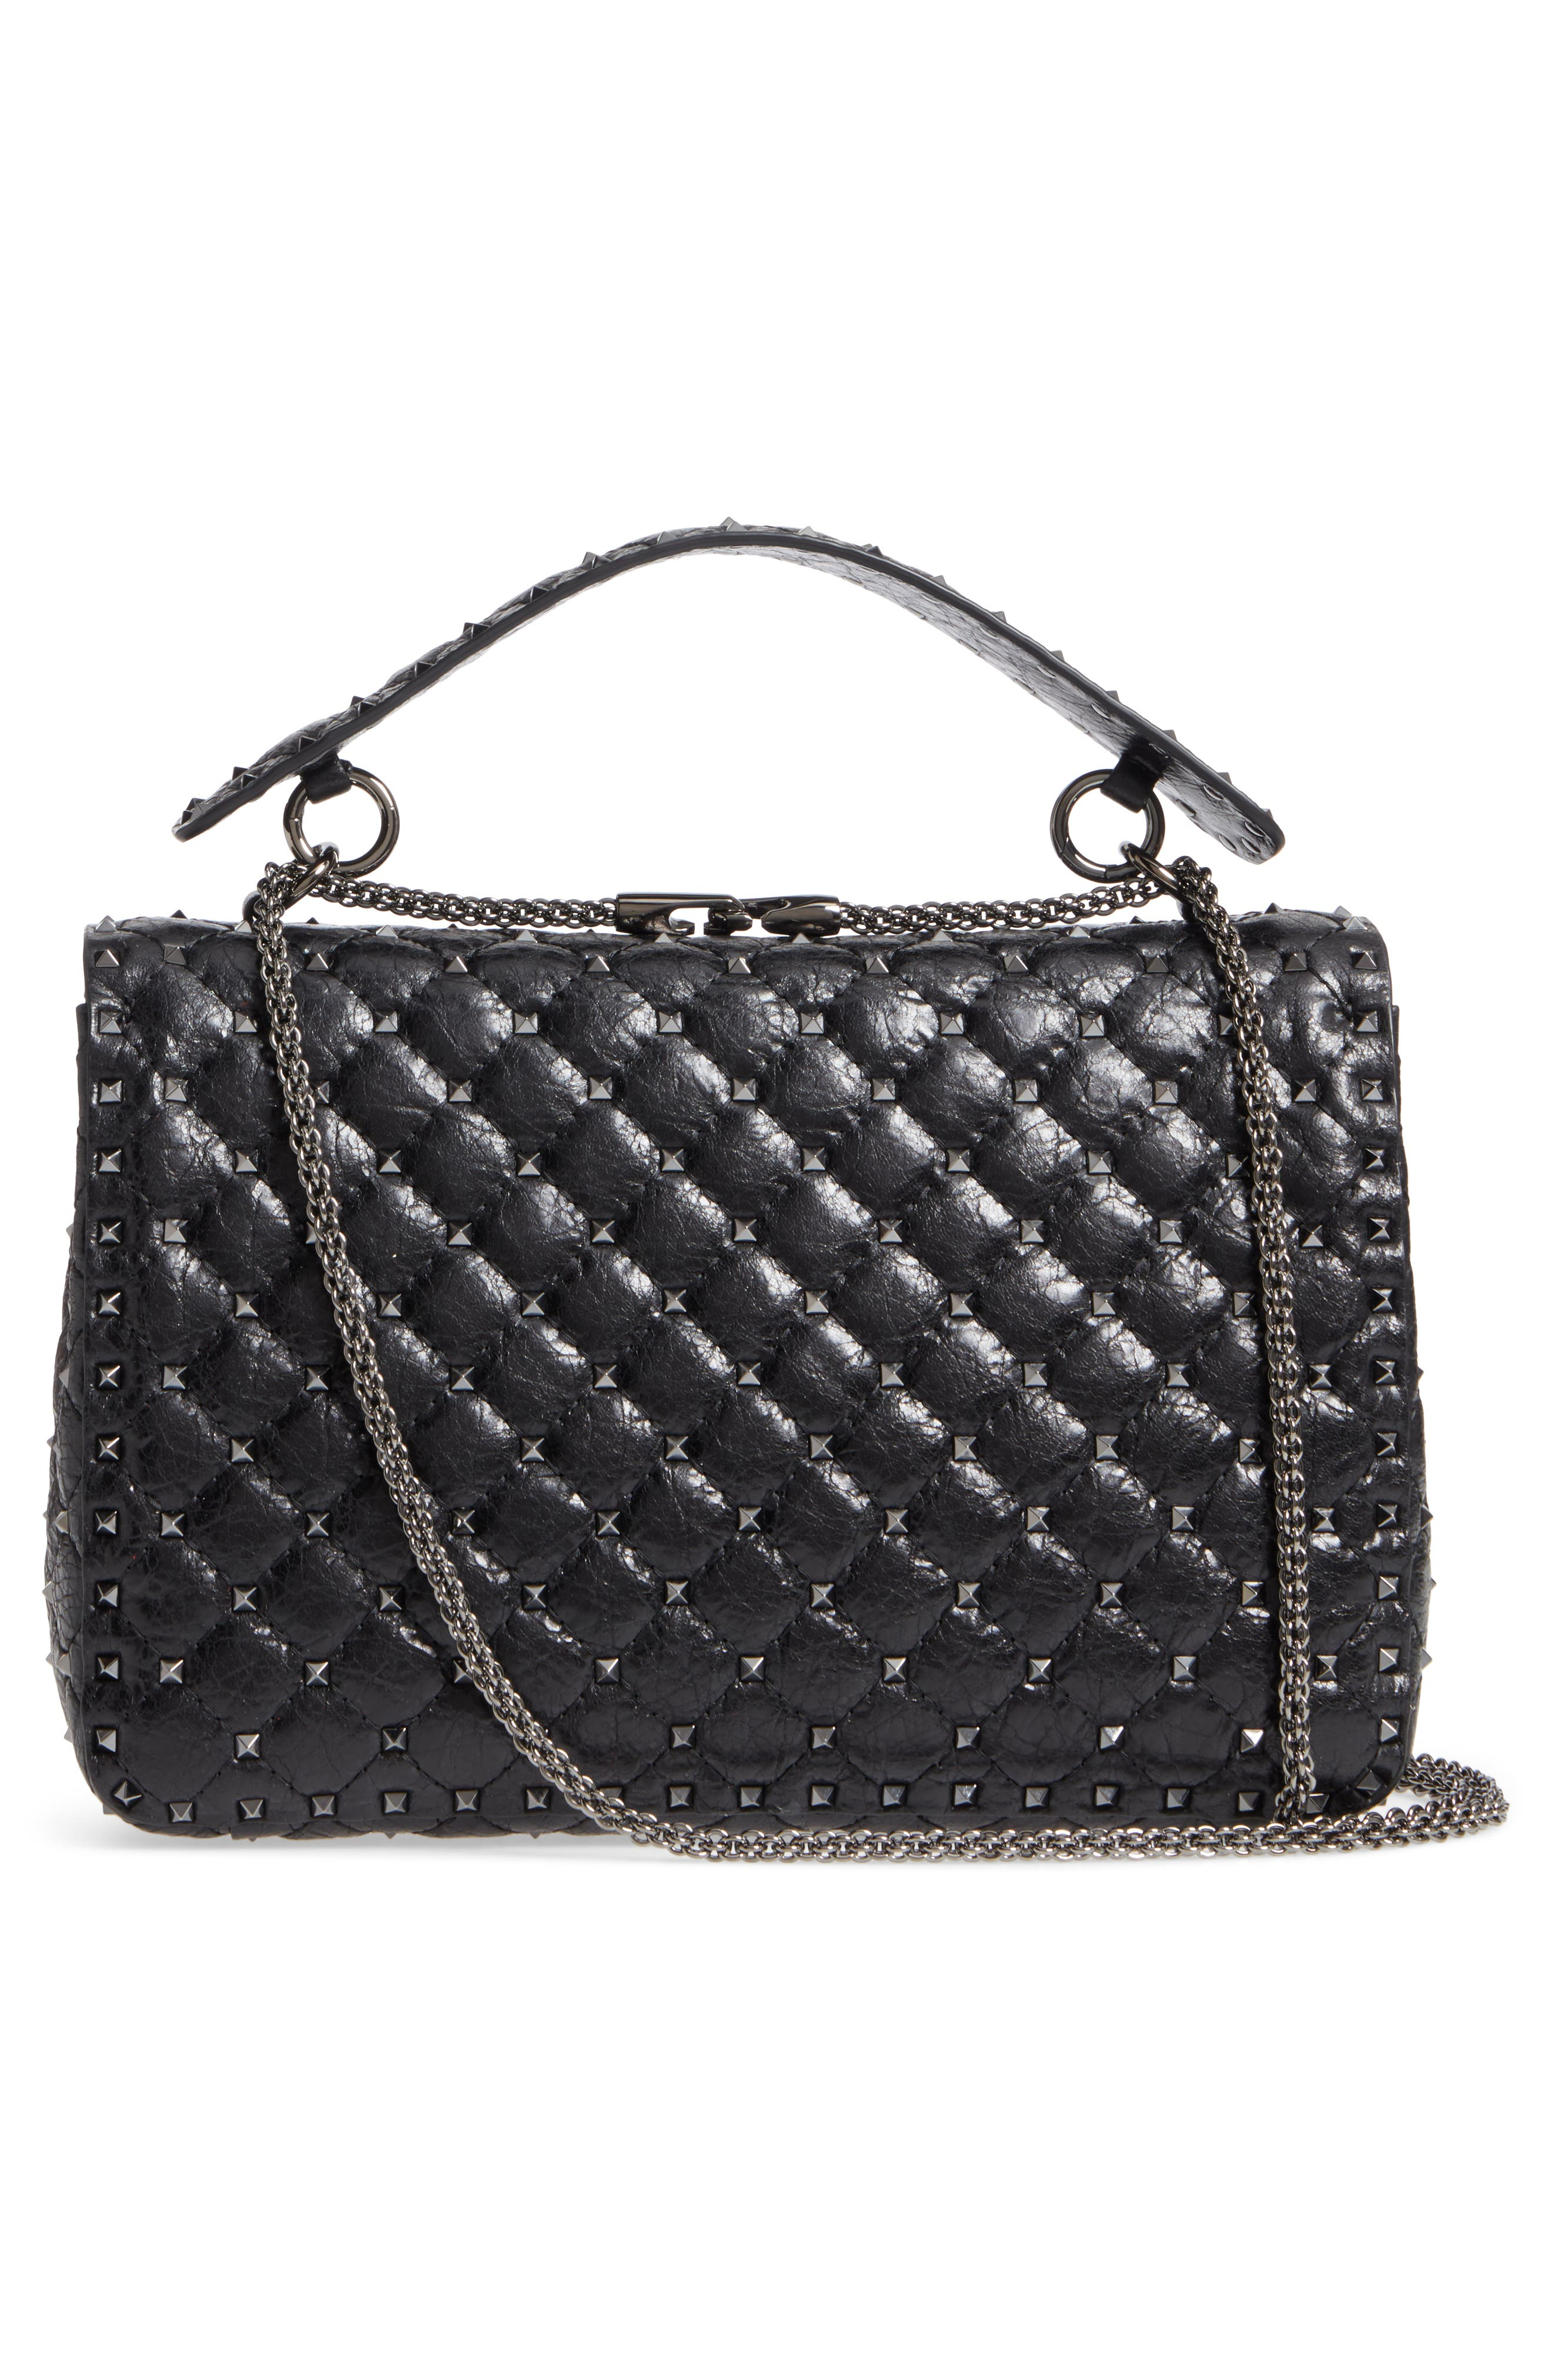 Vitello Rockstud Lambskin Leather Shoulder Bag,                             Alternate thumbnail 3, color,                             NERO